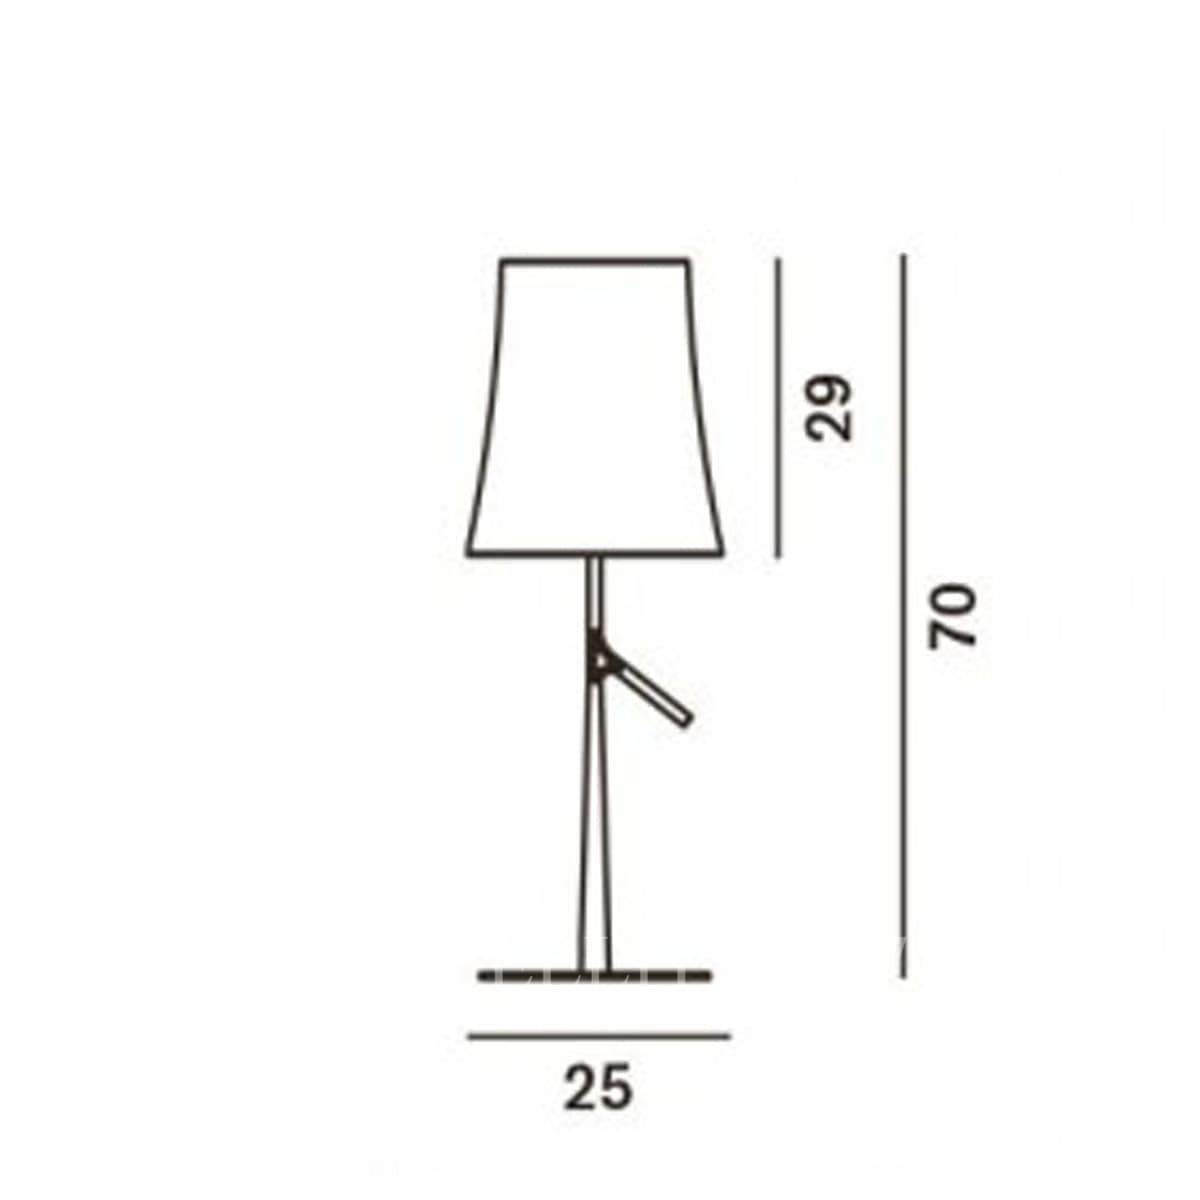 foscarini italian lighting designer table lamp birdie large measures